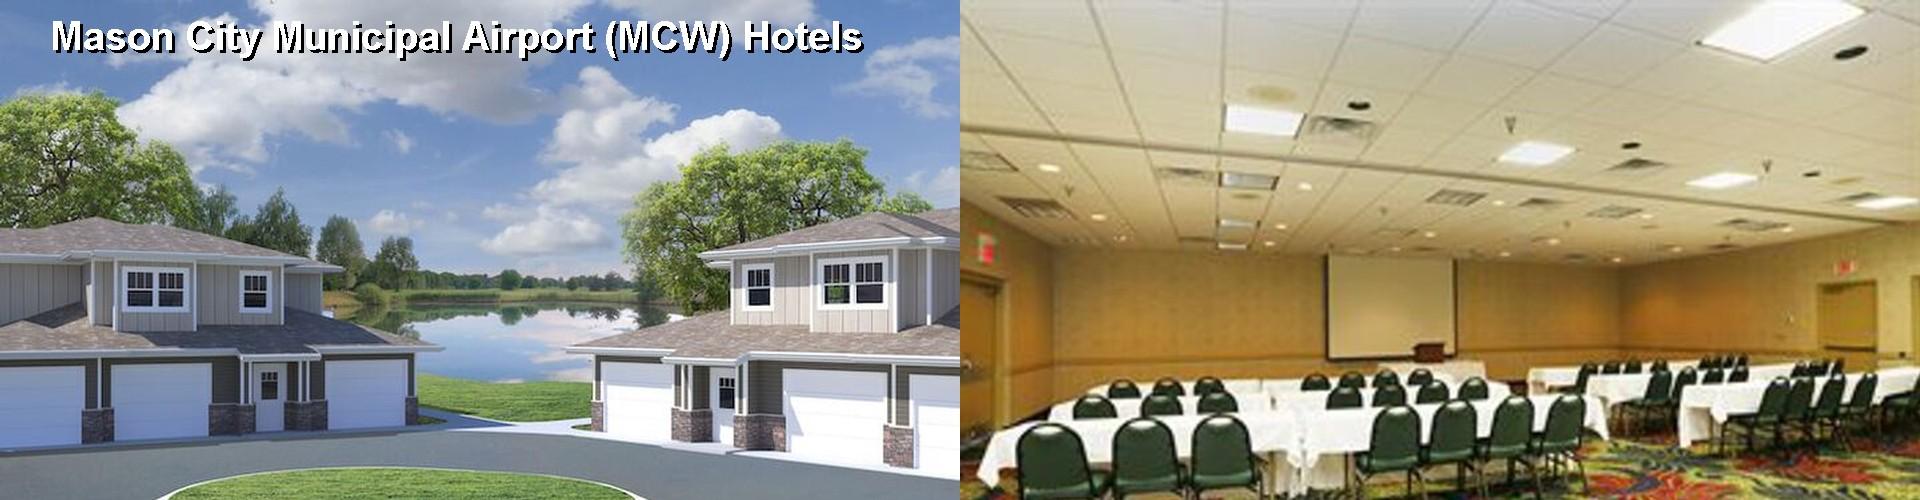 5 Best Hotels Near Mason City Munil Airport Mcw